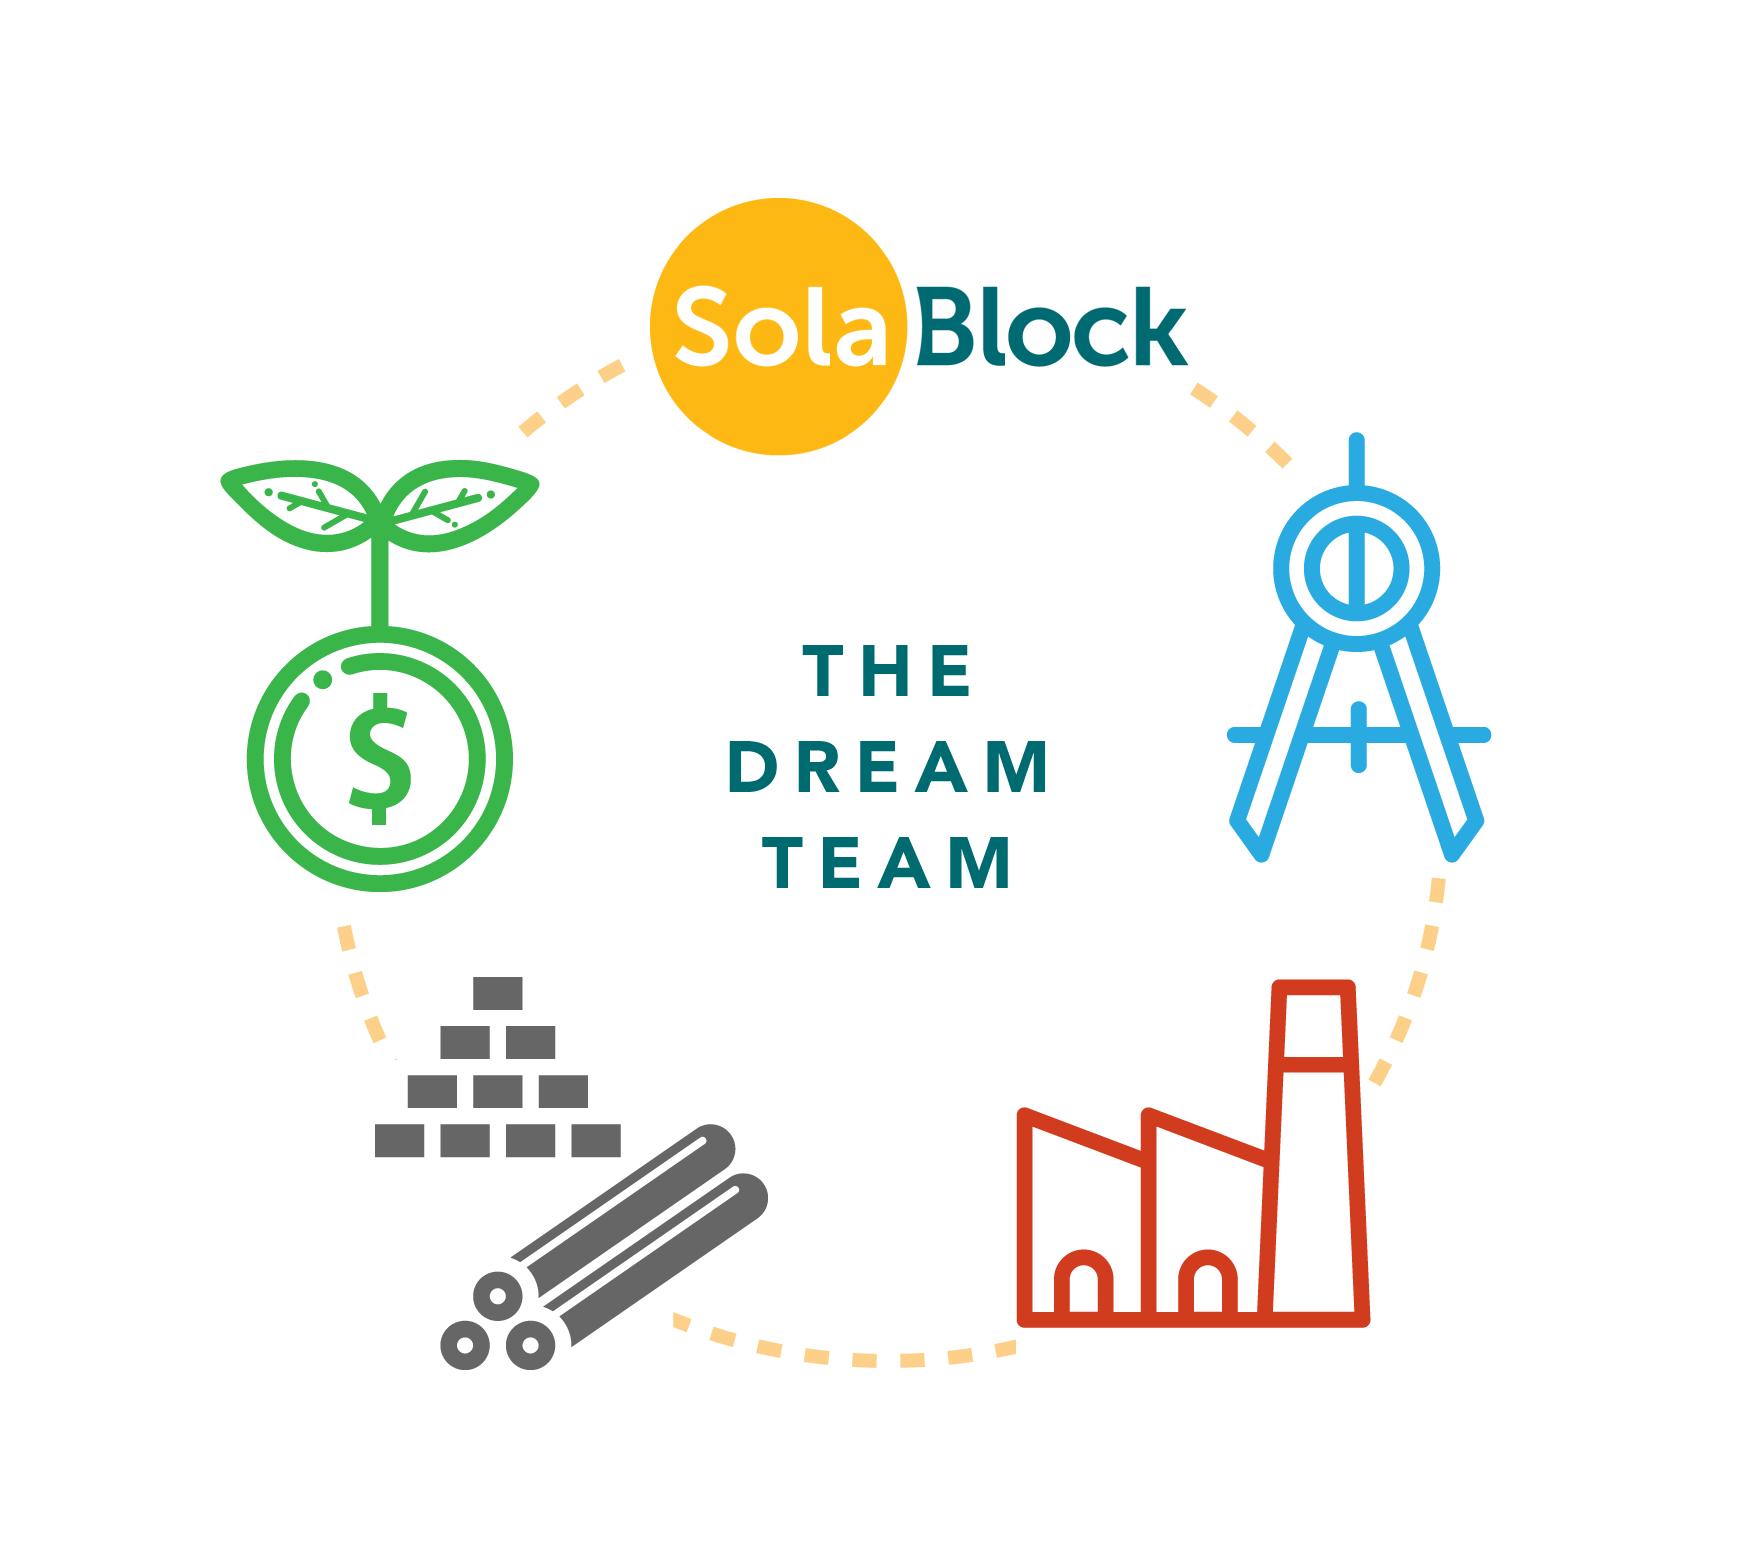 solablock-dream-team-venn-diagram-teal-words.png